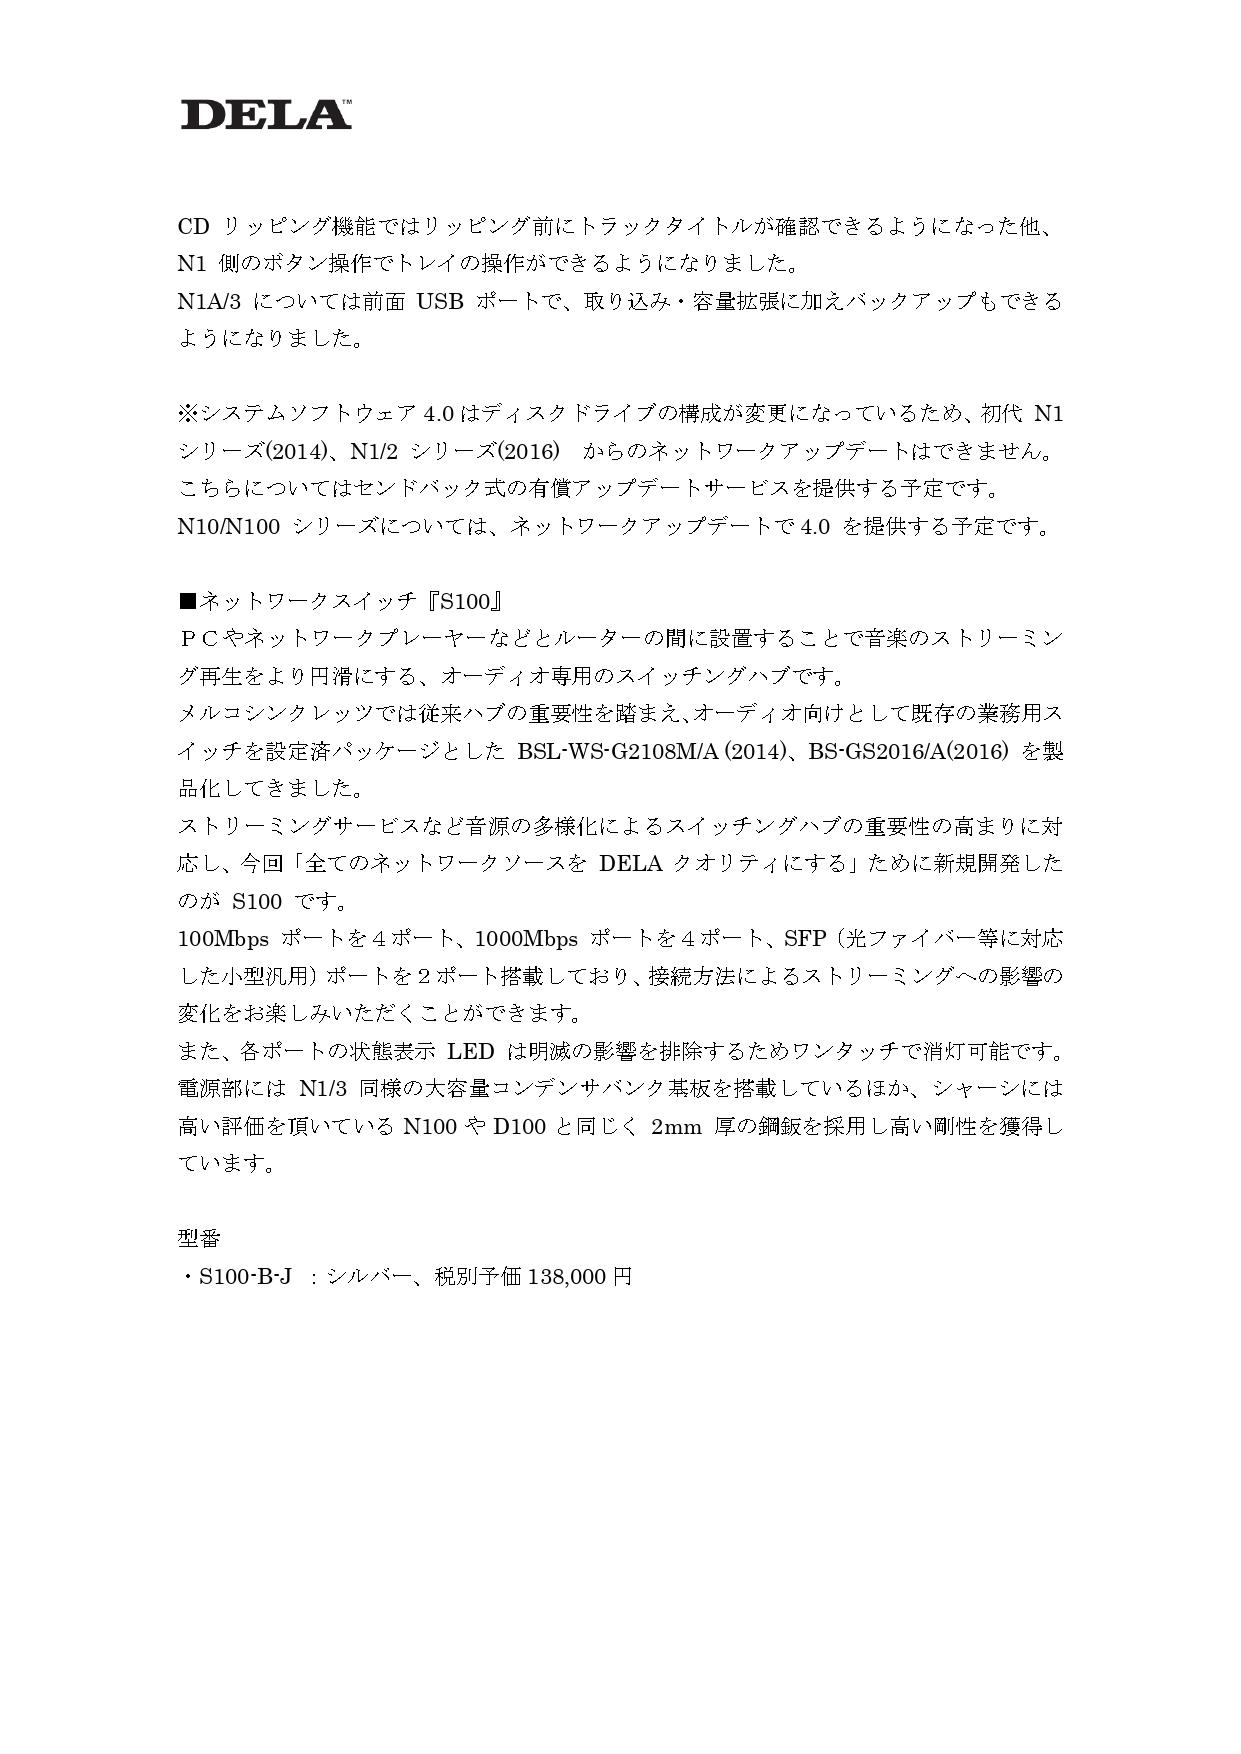 DELA 新製品 N1 MK3, S100_page-0004